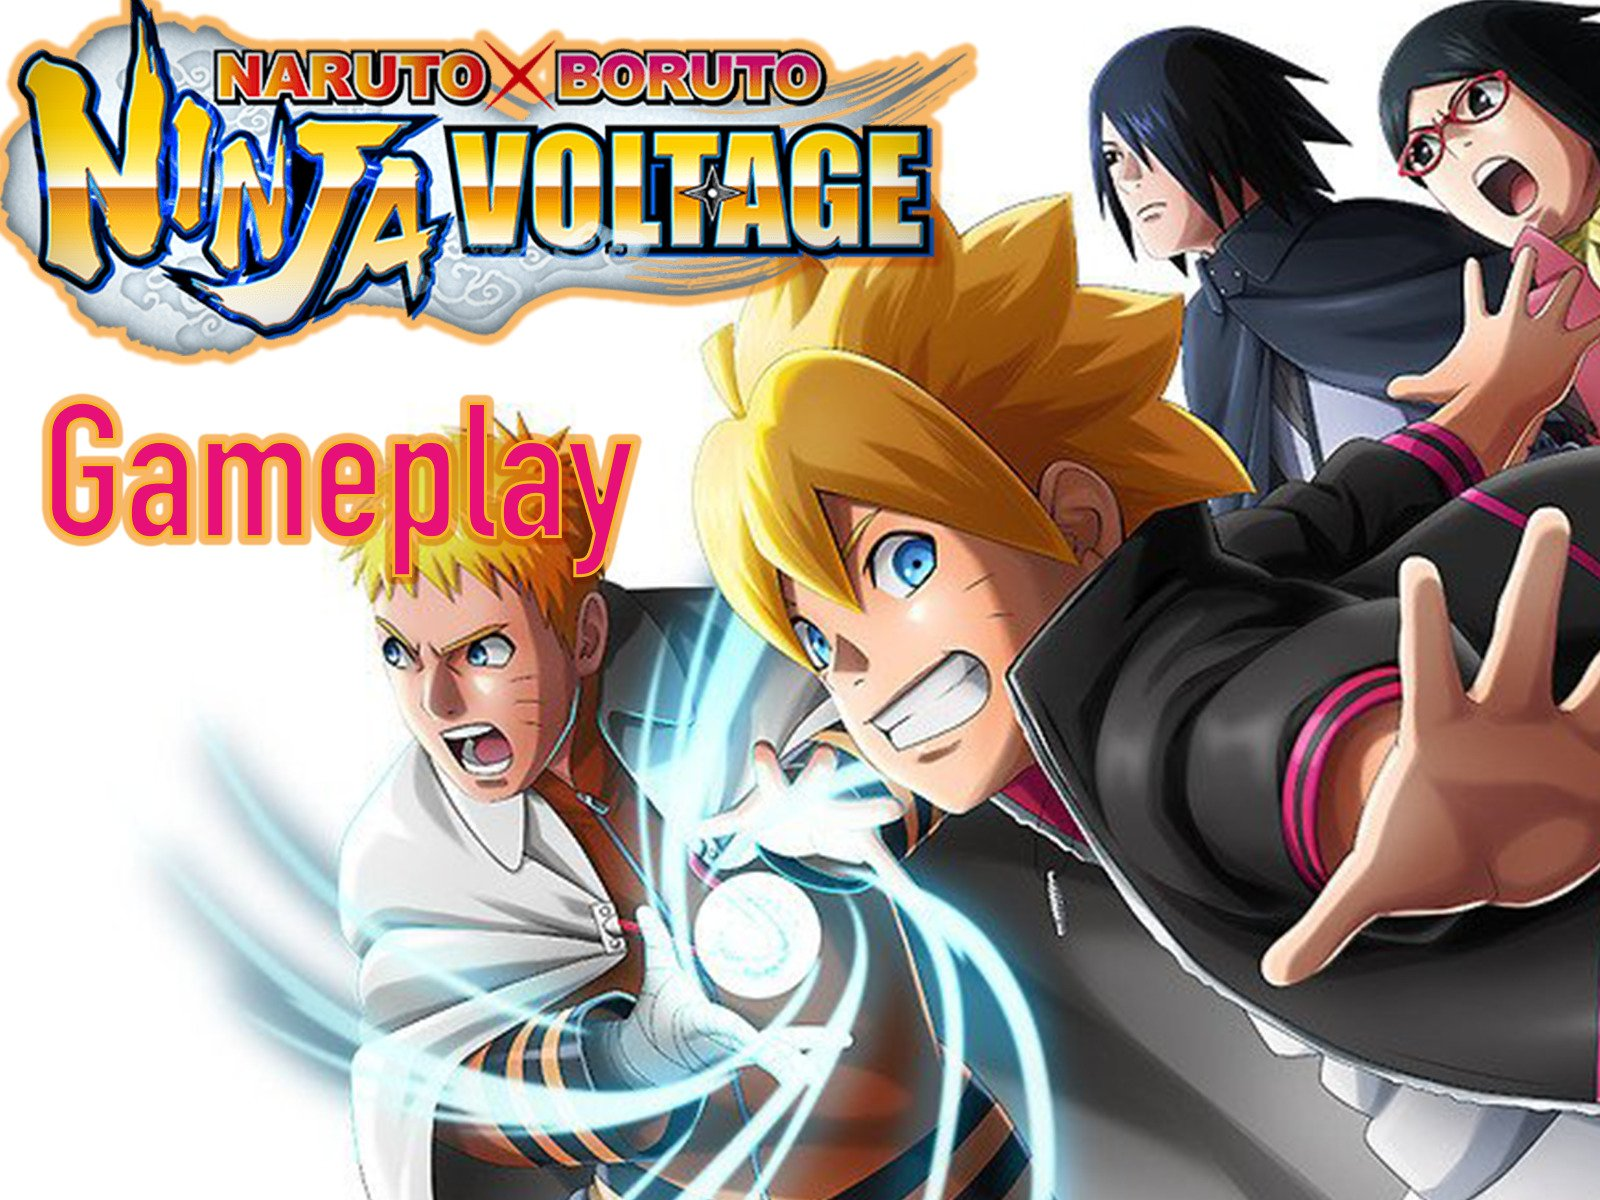 Naruto X Boruto Ninja Voltage Gameplay - Season 1